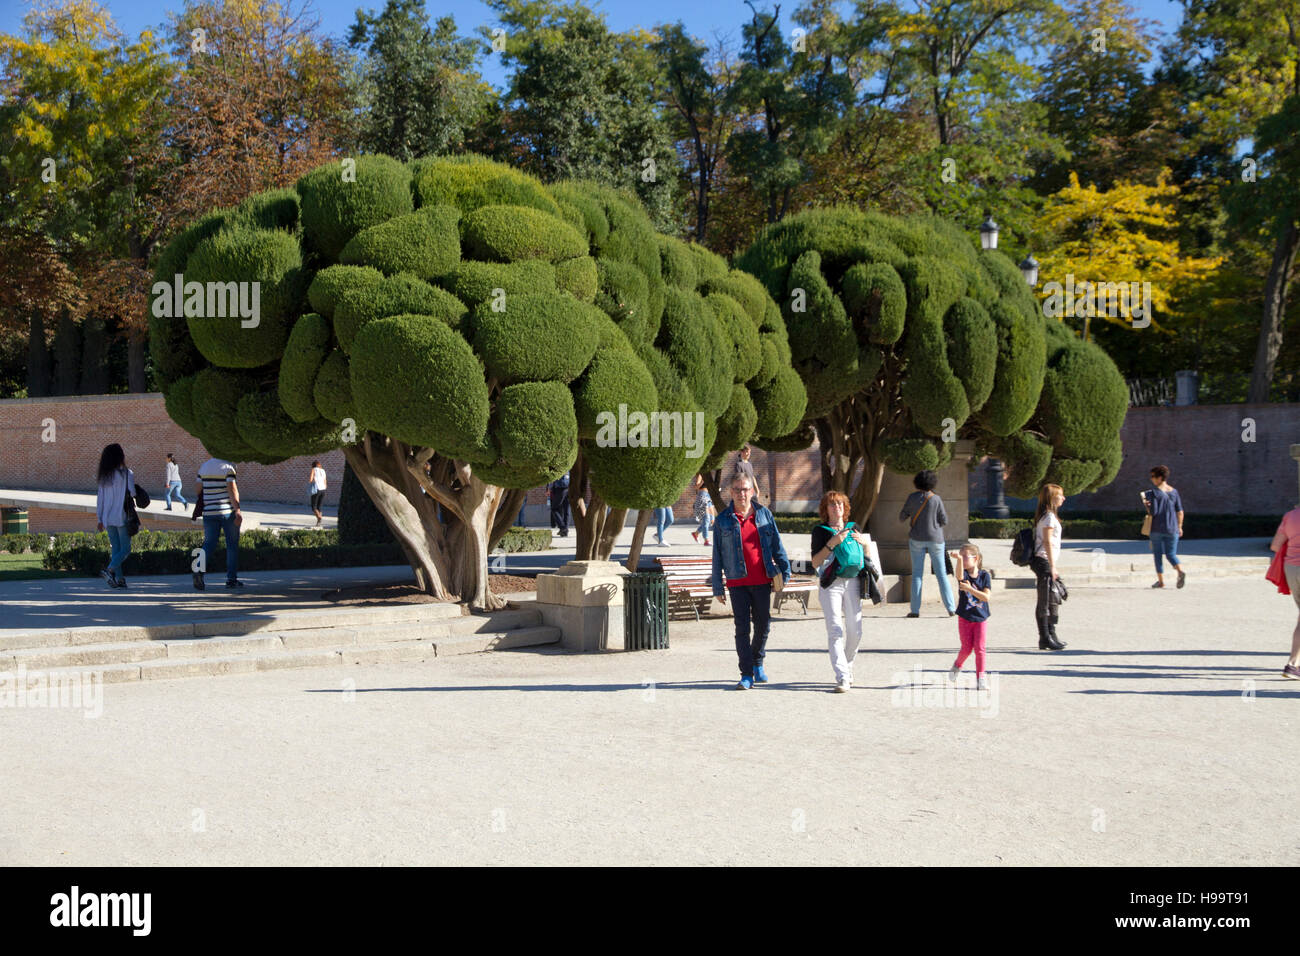 Madrid Spain Park of Retiro tourists visiting day people - Stock Image